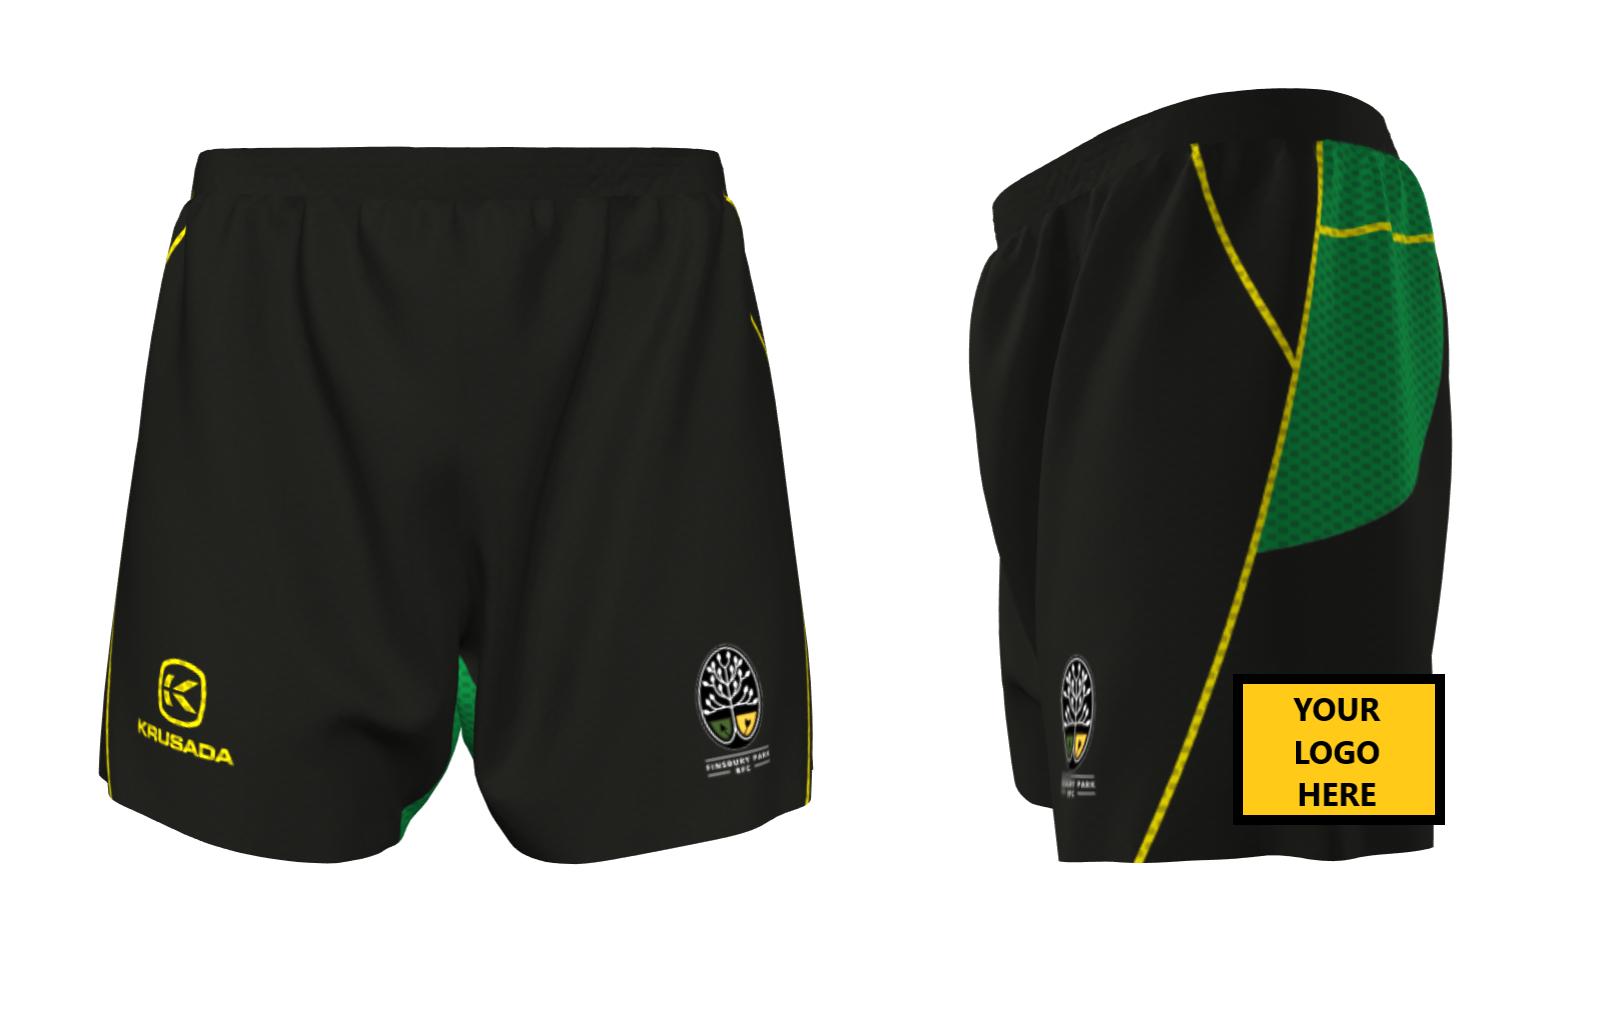 Playing shorts sponsor